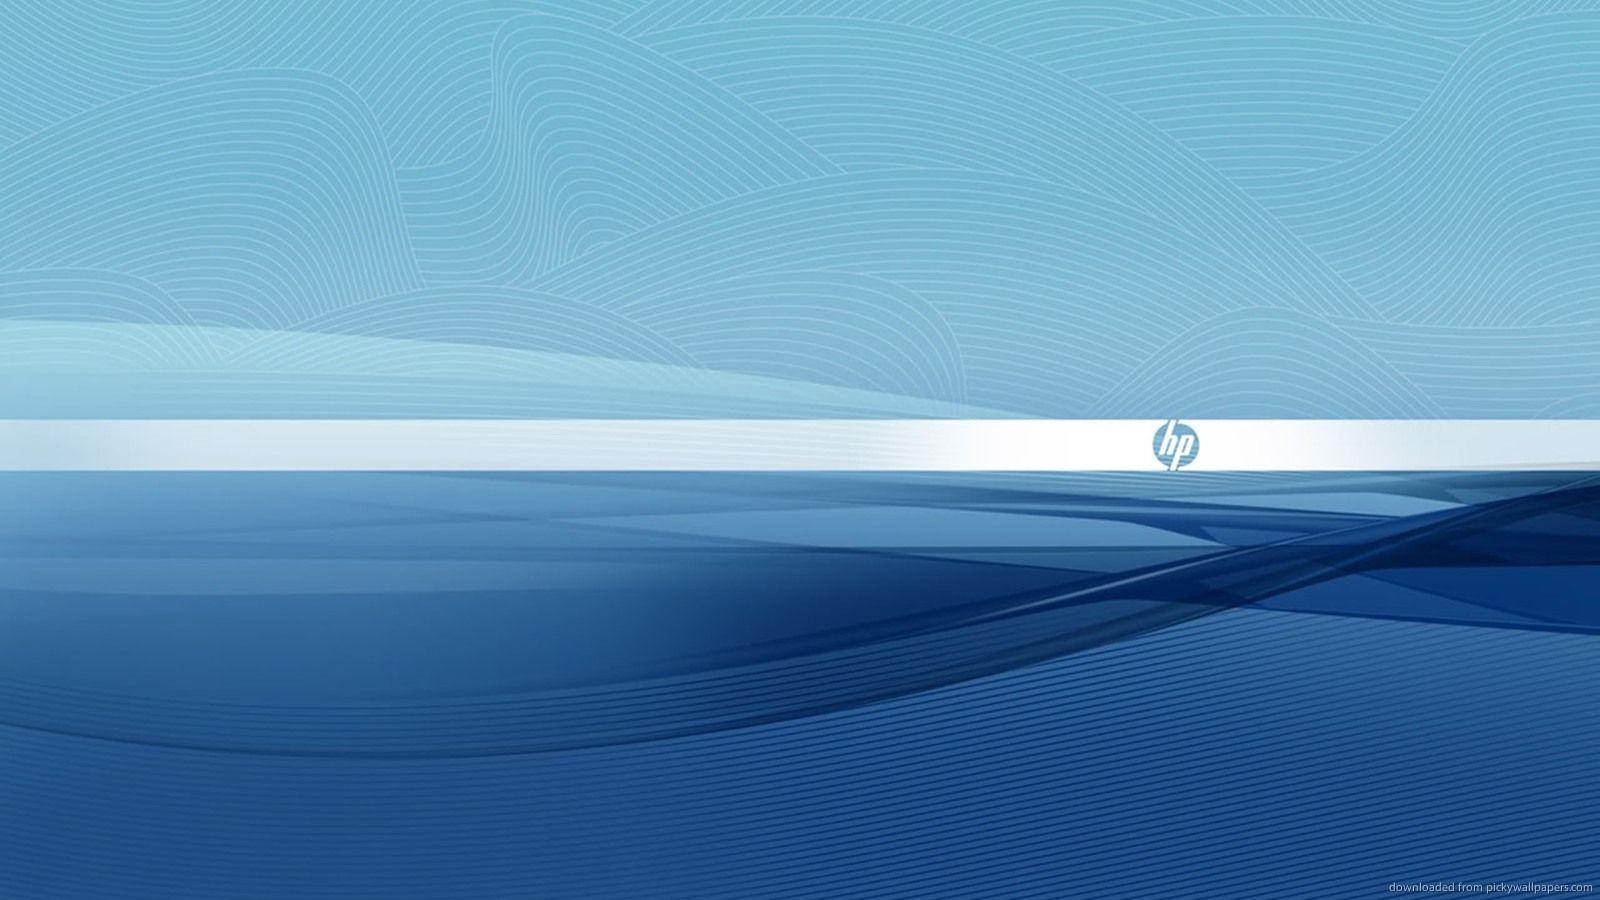 Download 1600x900 HP Calmness Wallpaper